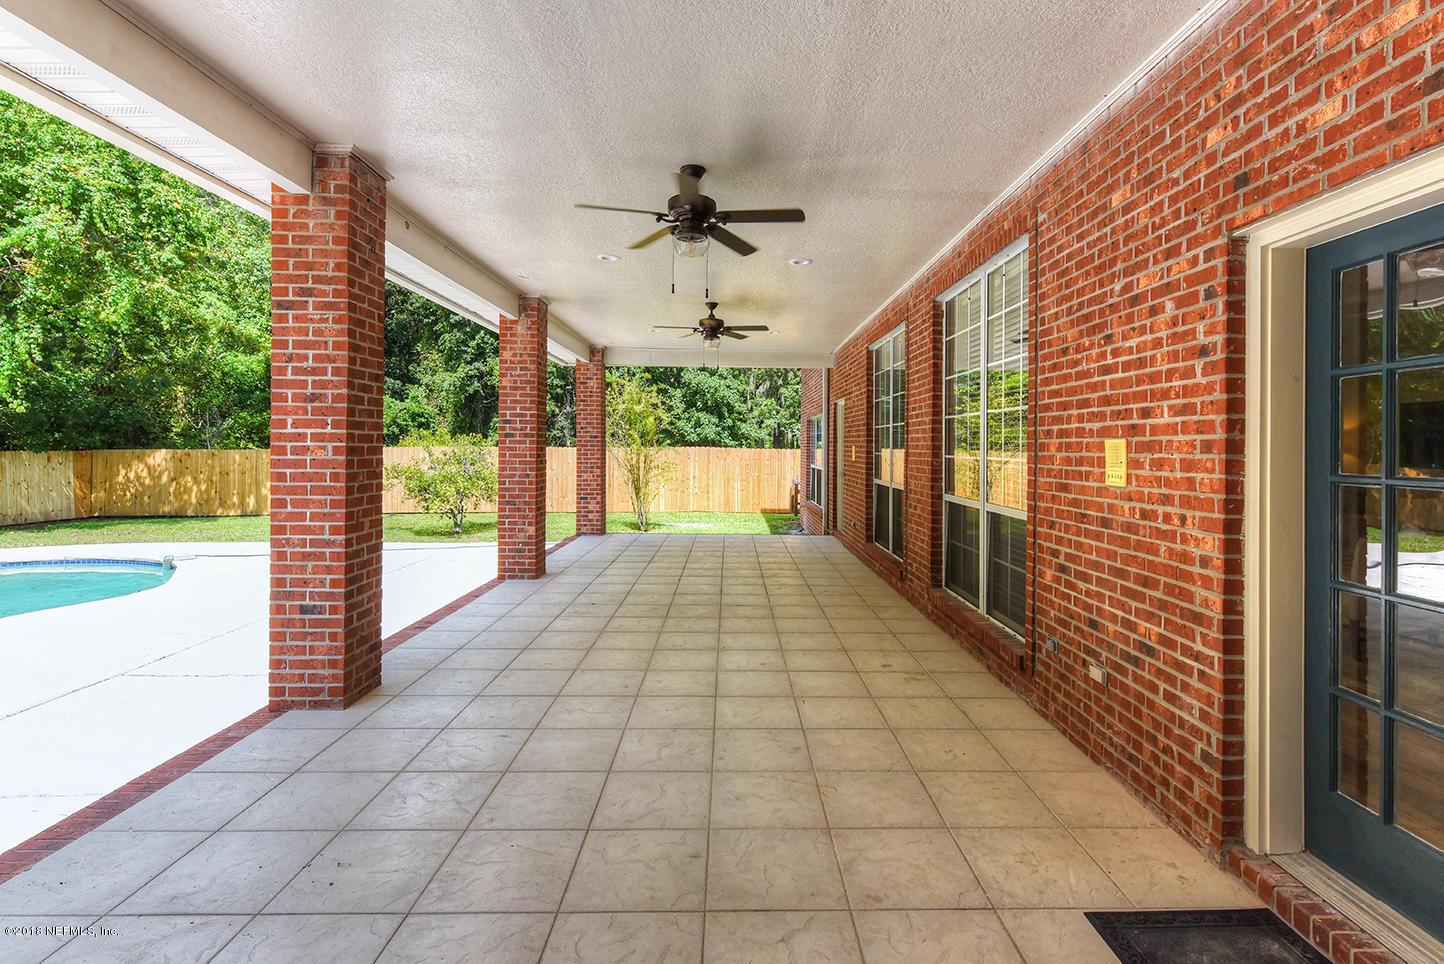 14511 MANDARIN, JACKSONVILLE, FLORIDA 32223, 5 Bedrooms Bedrooms, ,5 BathroomsBathrooms,Residential - single family,For sale,MANDARIN,951918